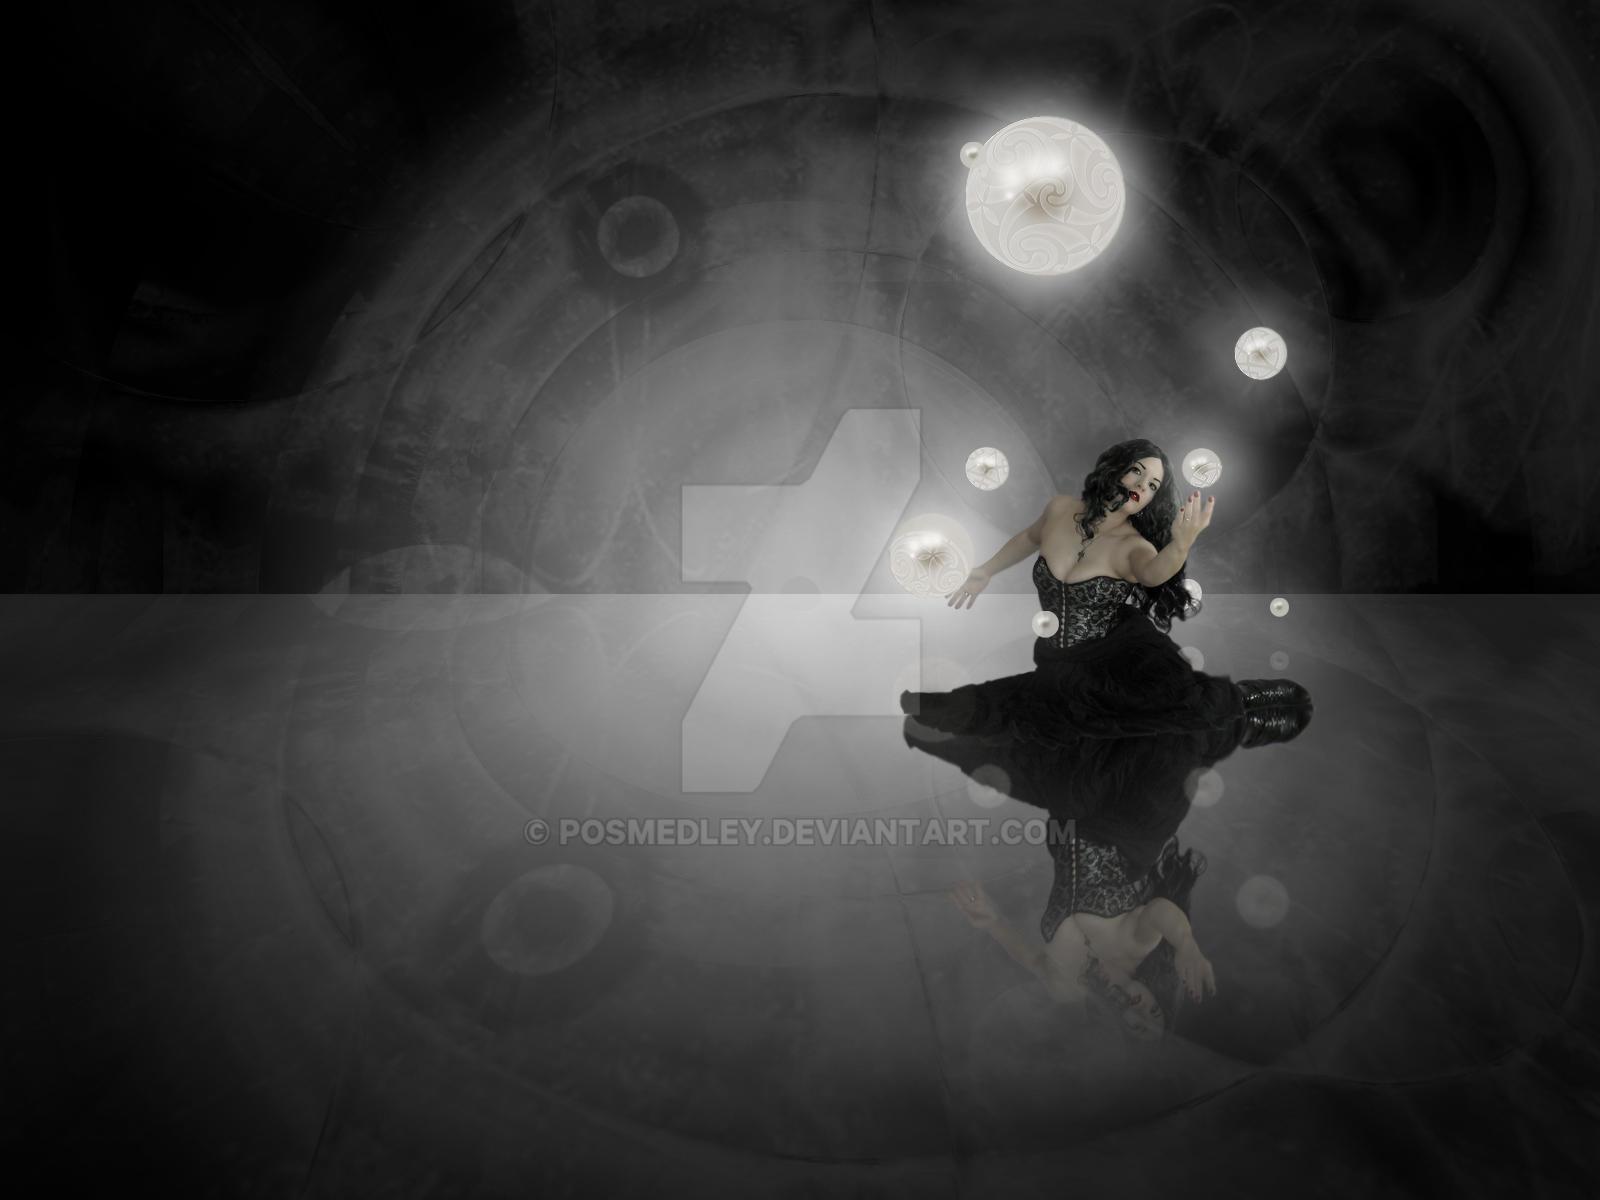 Pandoras Return by PoSmedley